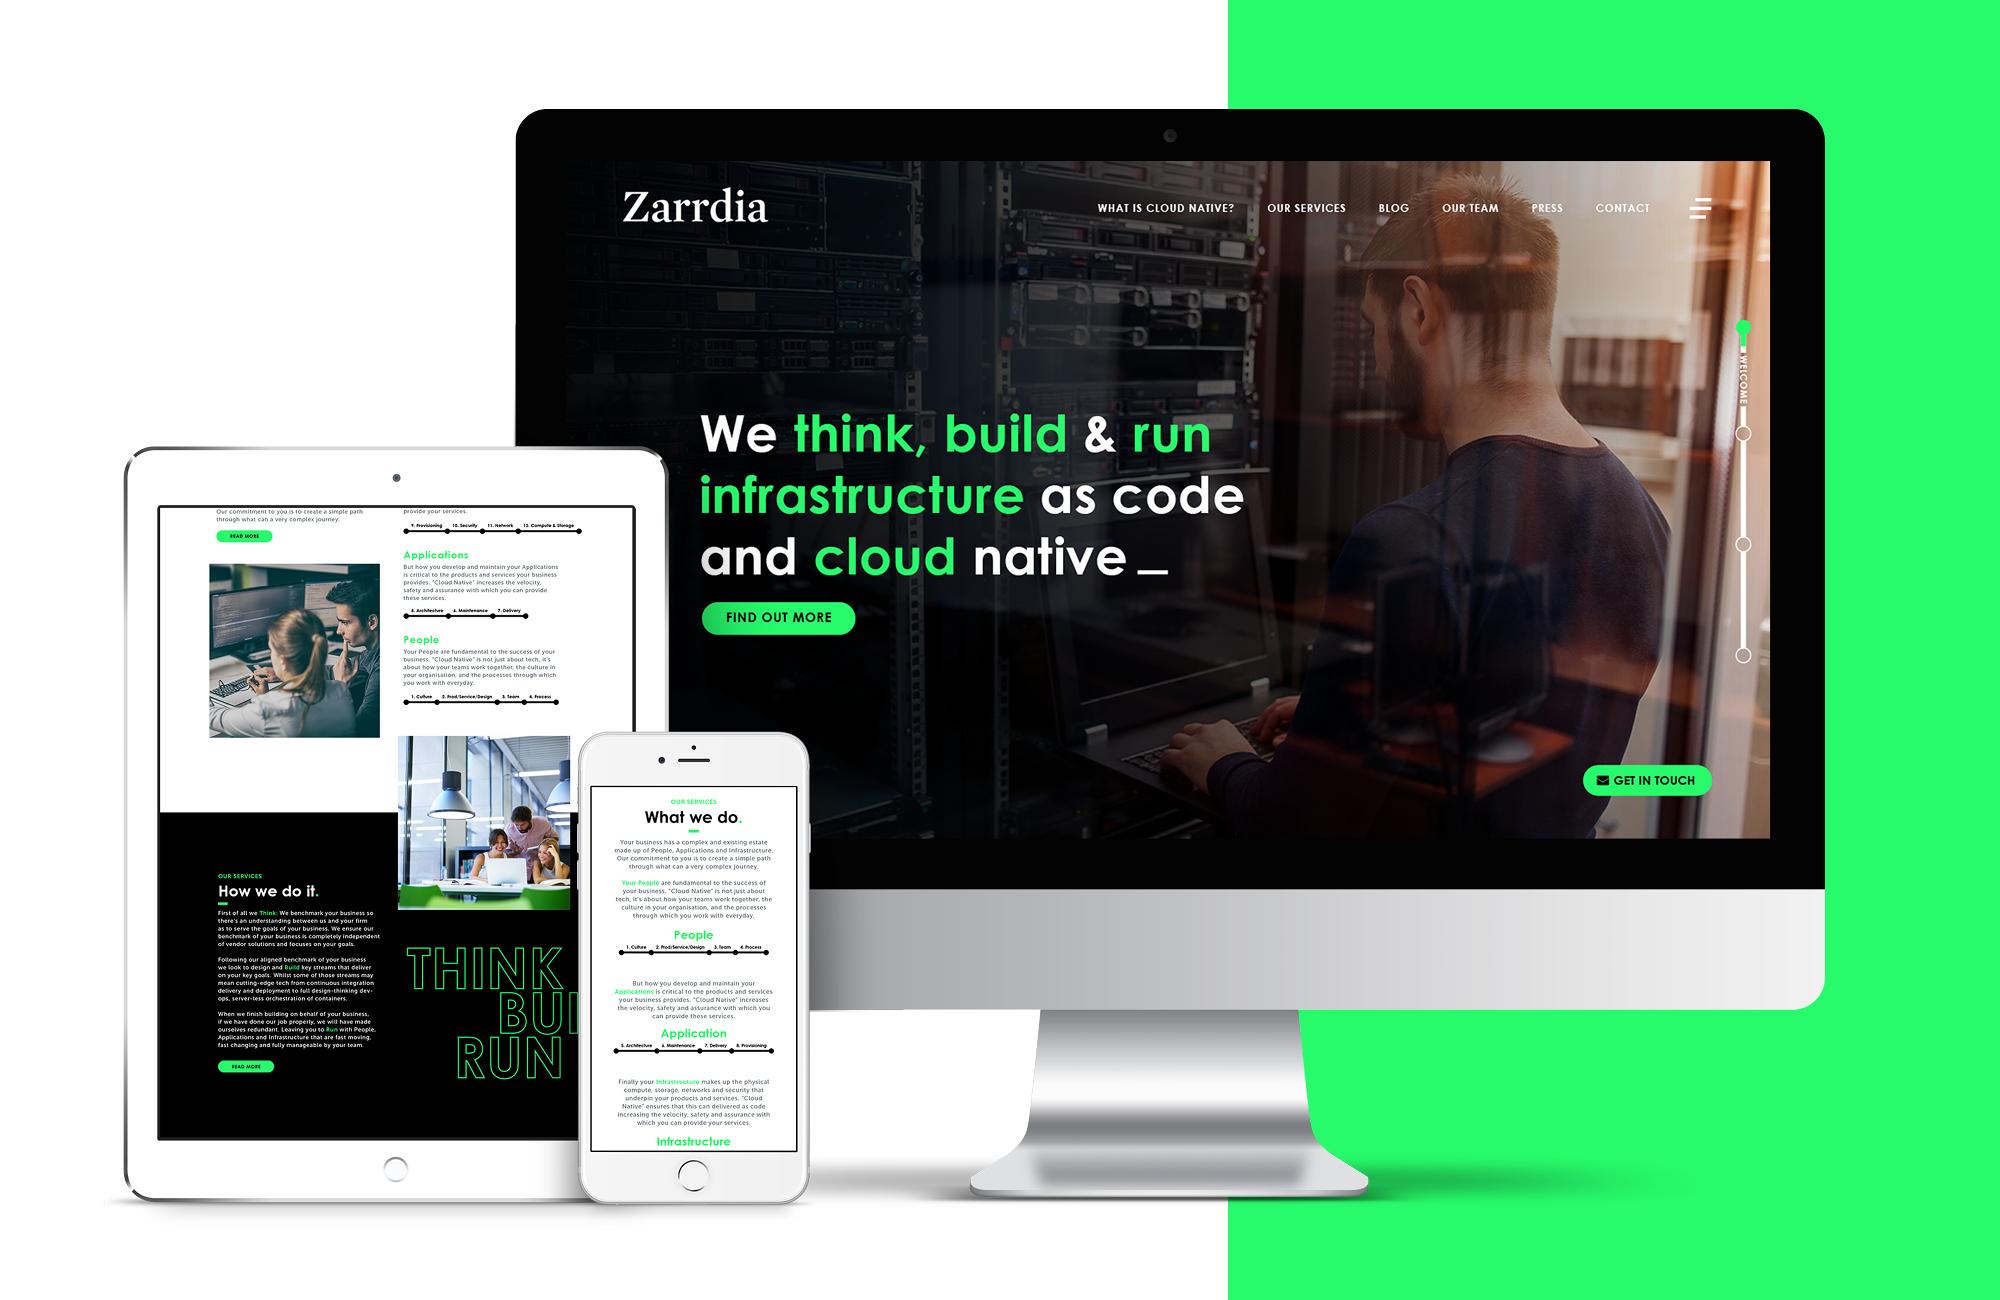 Cover image: Zarrdia Website